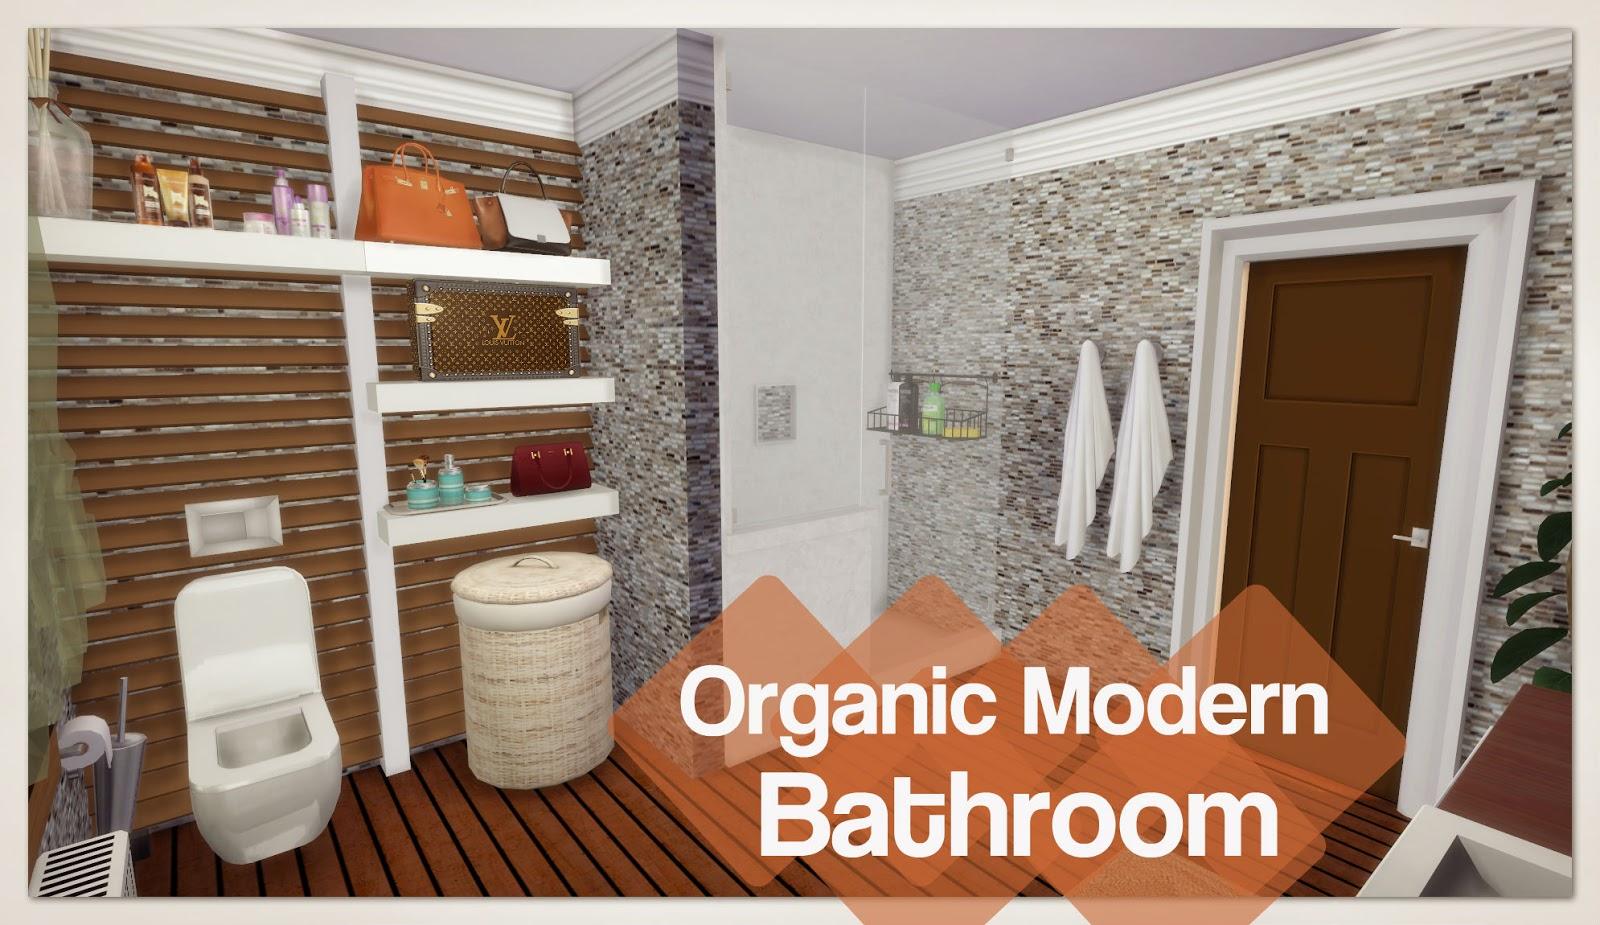 Sims 4 Organic Modern Bathroom Room Mods For Download Dinha